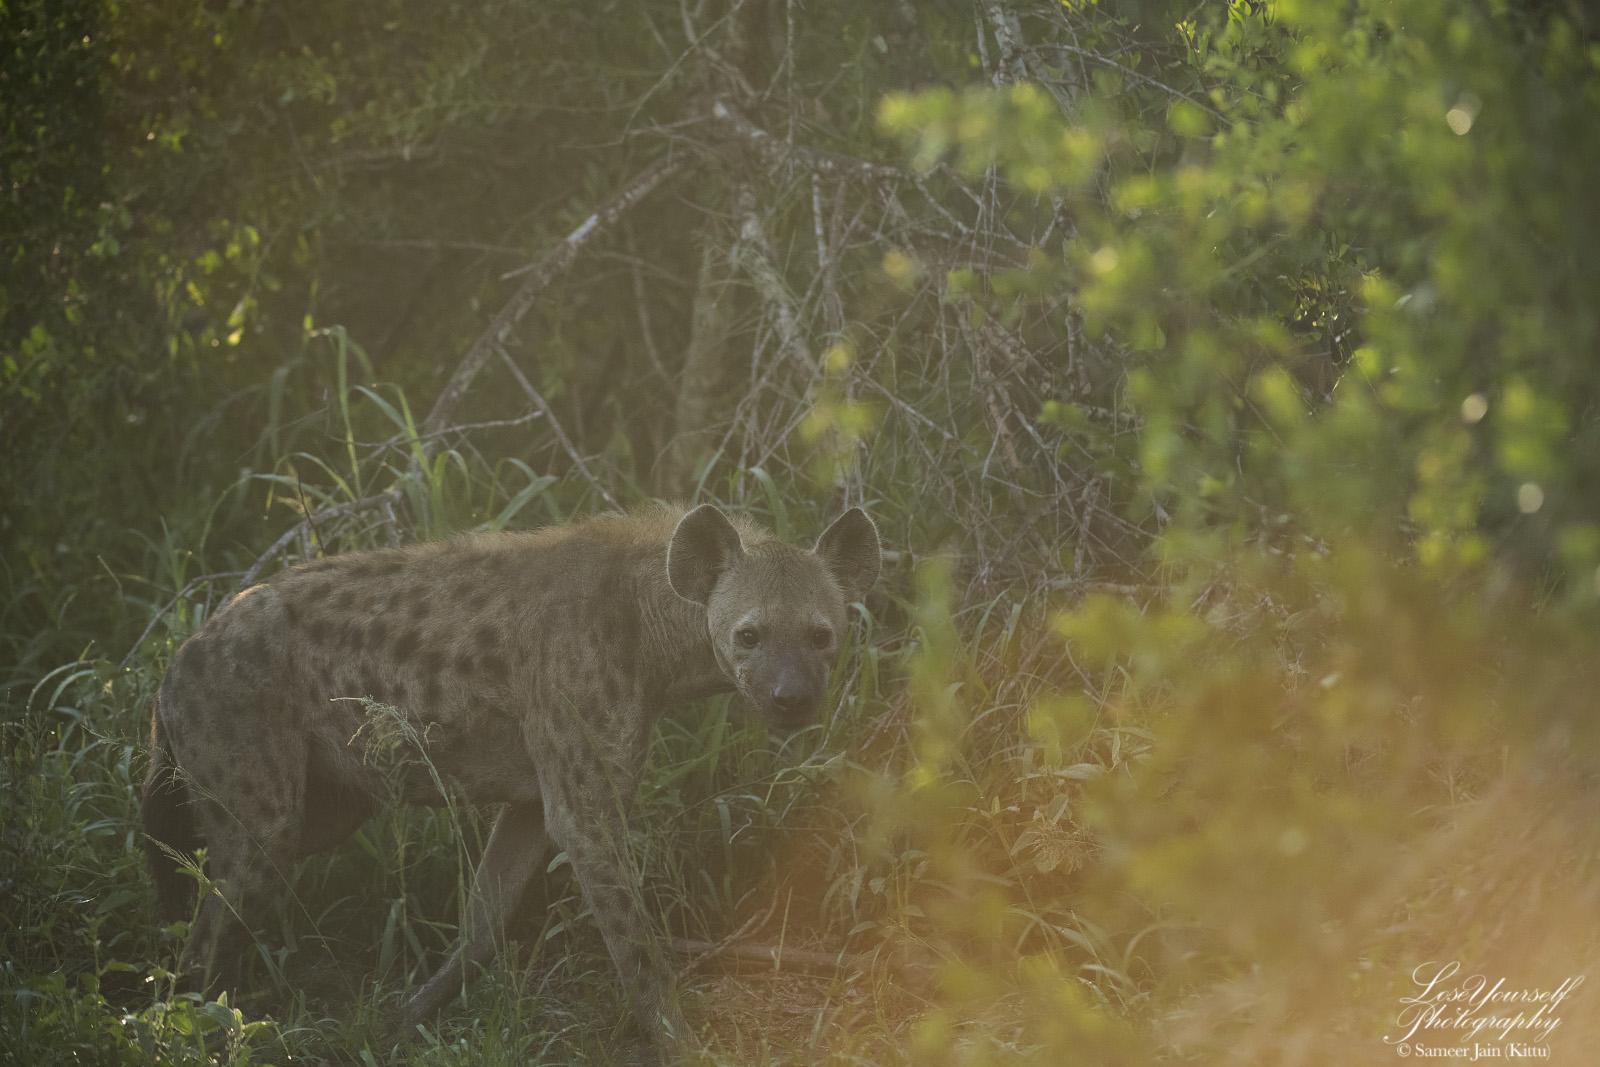 Hyena_SJK8181